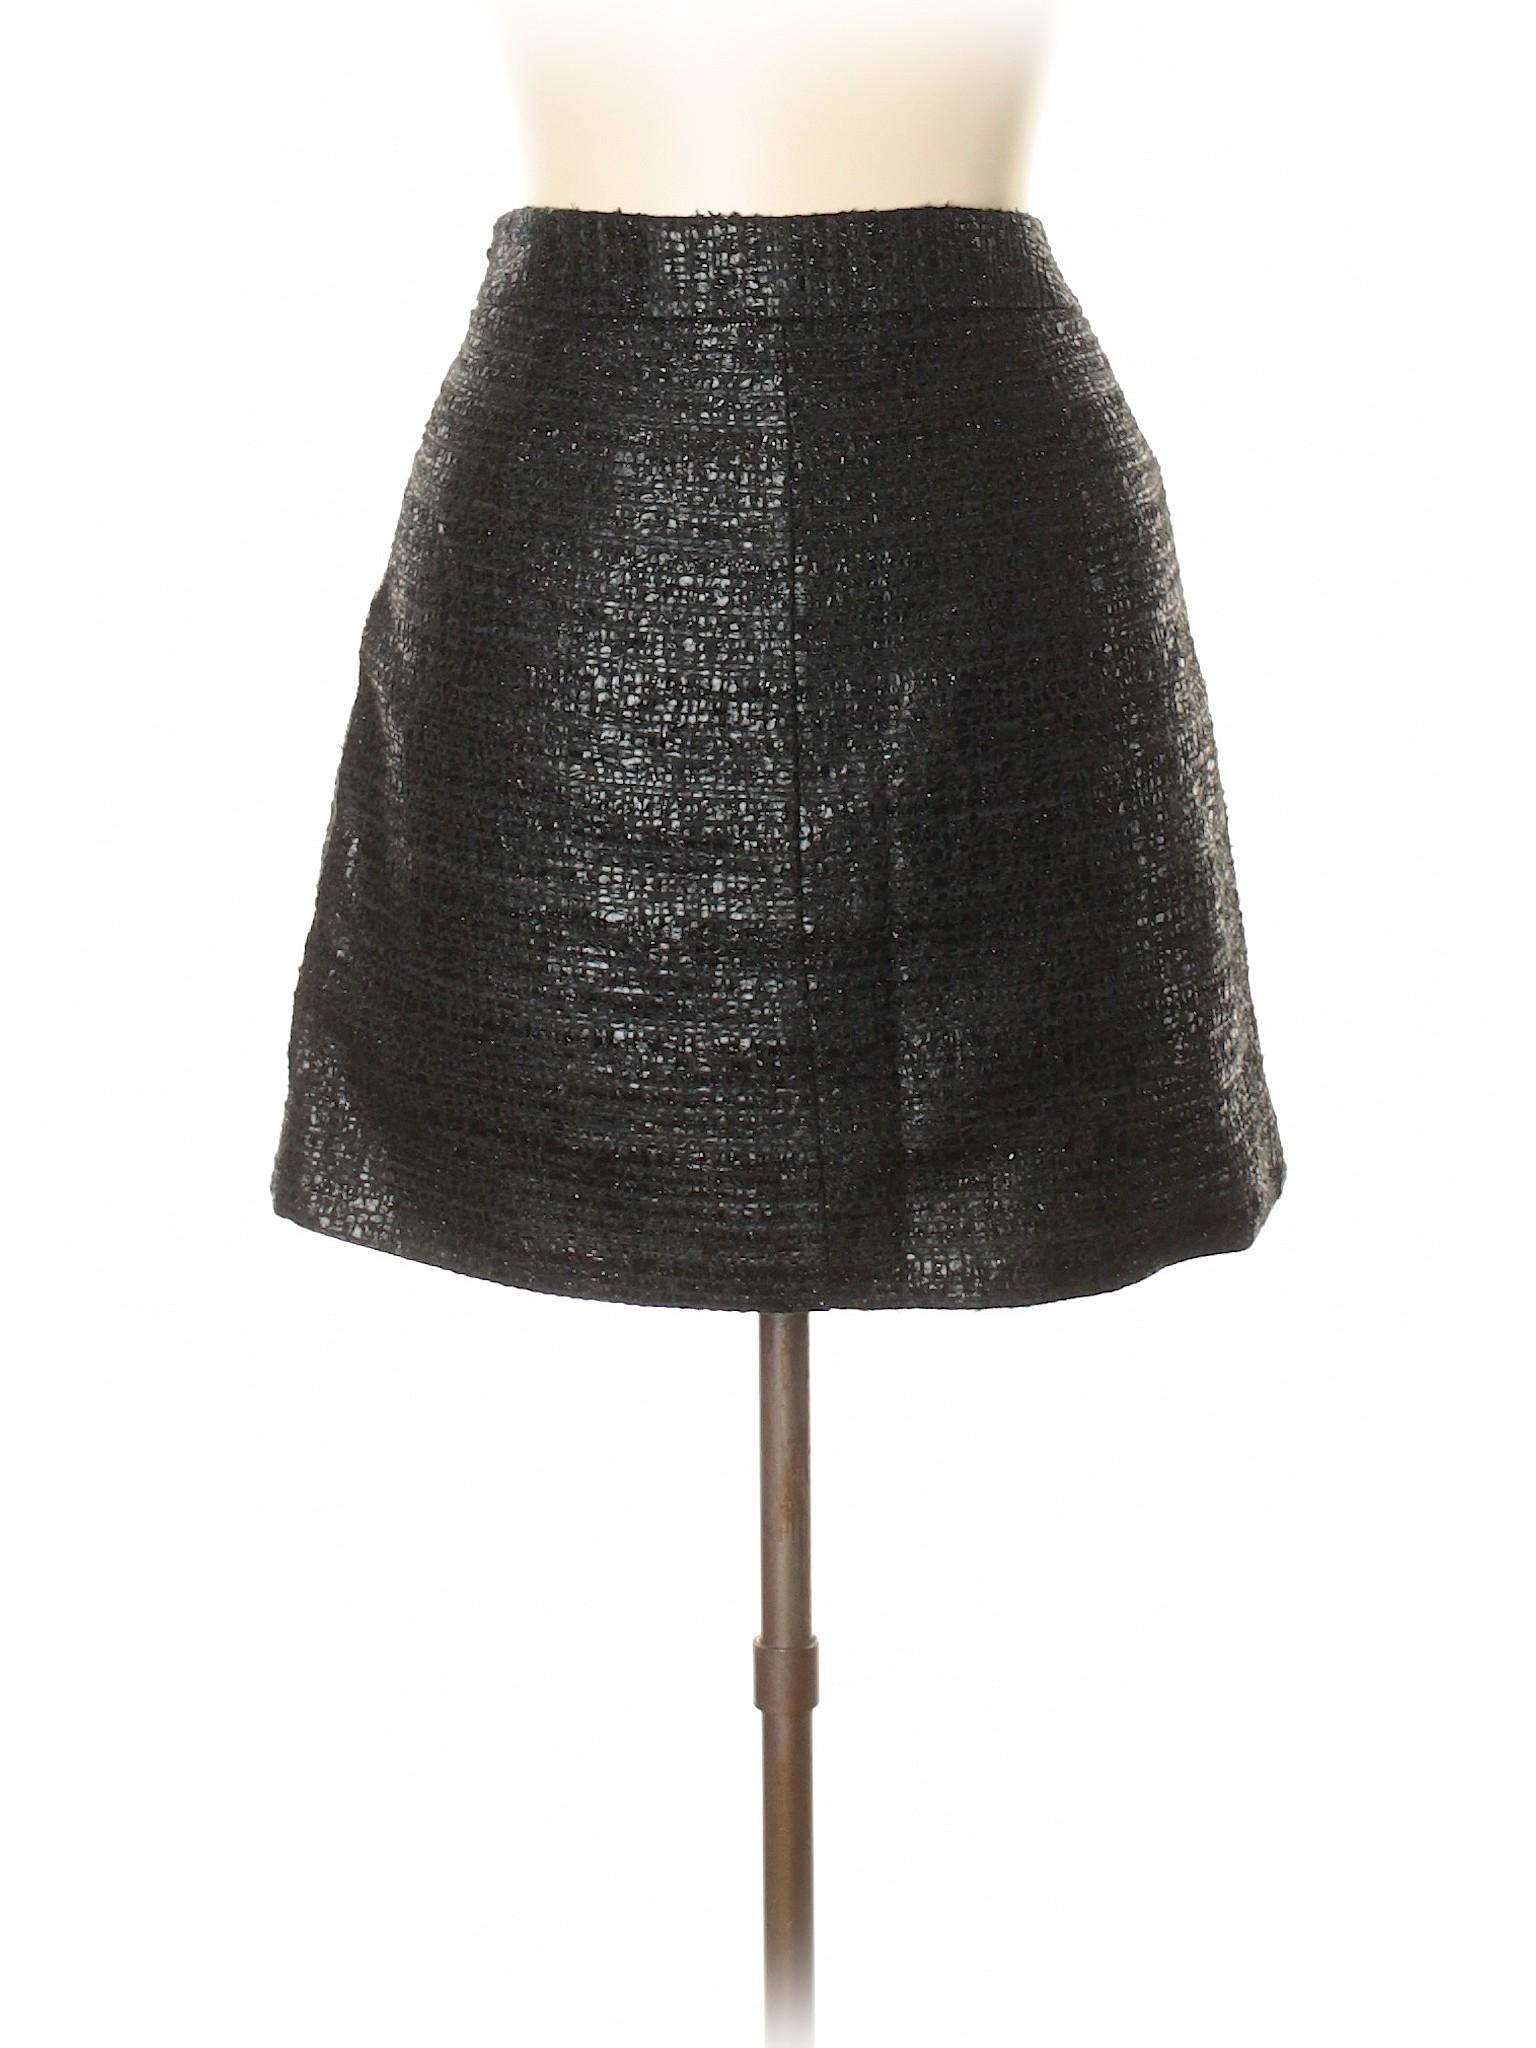 Boutique Skirt Boutique Skirt Boutique Skirt Skirt Formal Skirt Boutique Formal Boutique Boutique Formal Formal Formal Hwrt1pqH